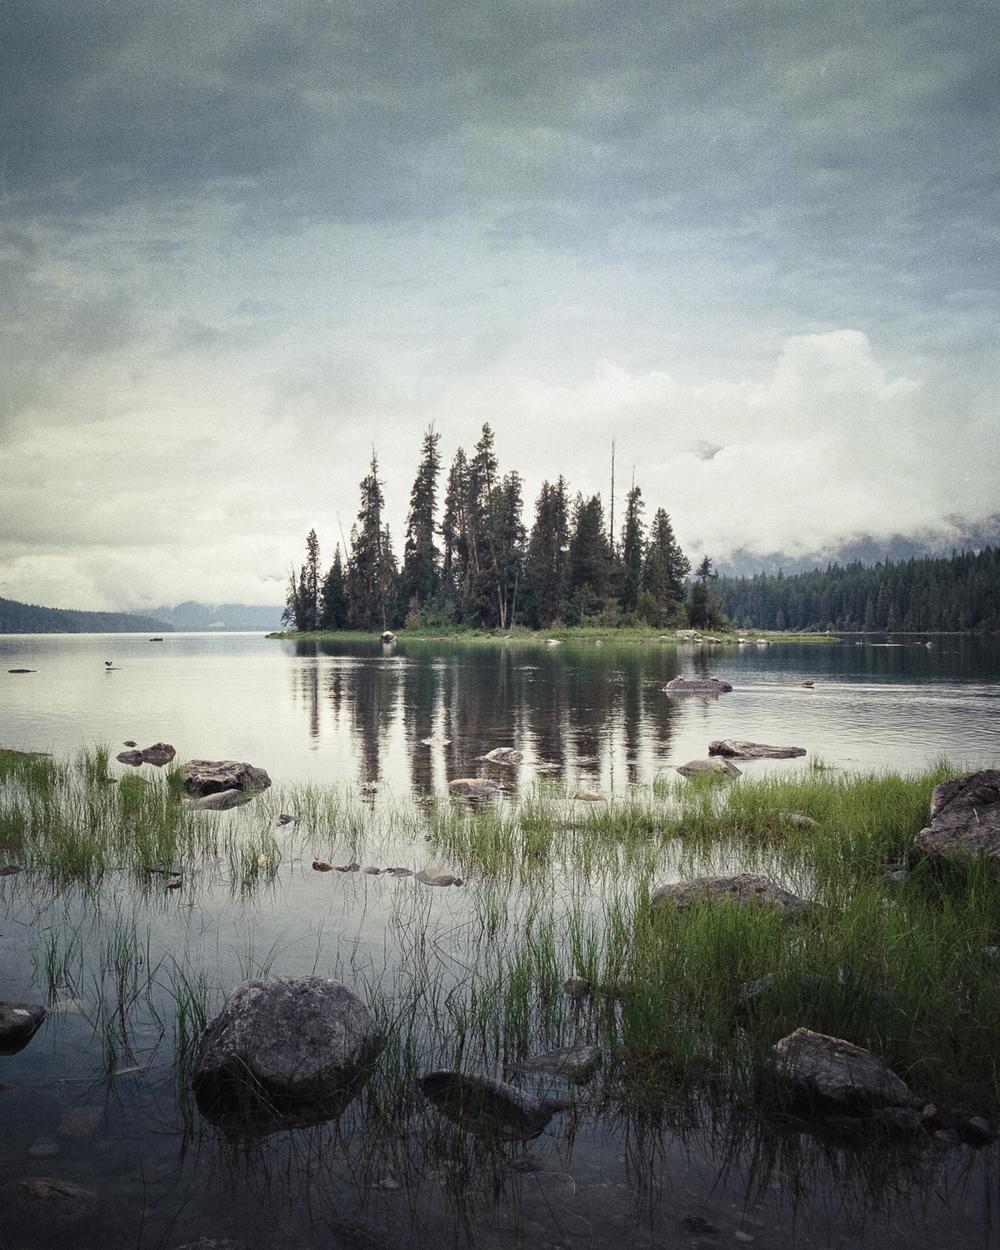 Lake_wenatchee_1-Edit.jpg